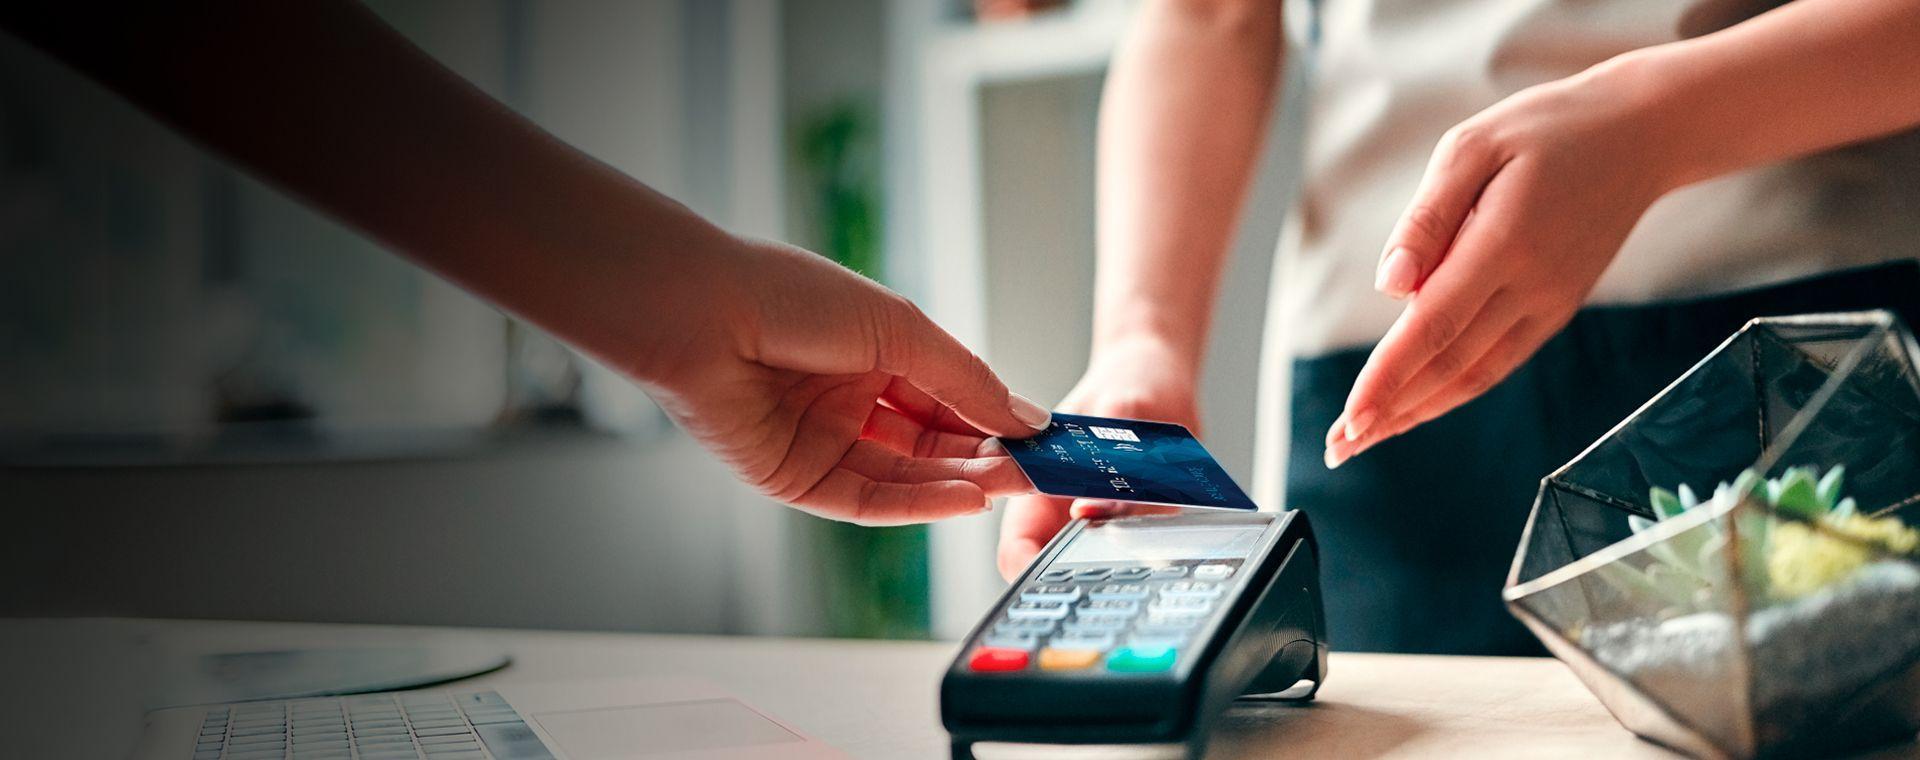 El uso de tarjetas de débito aumentó 14,29% en 2020